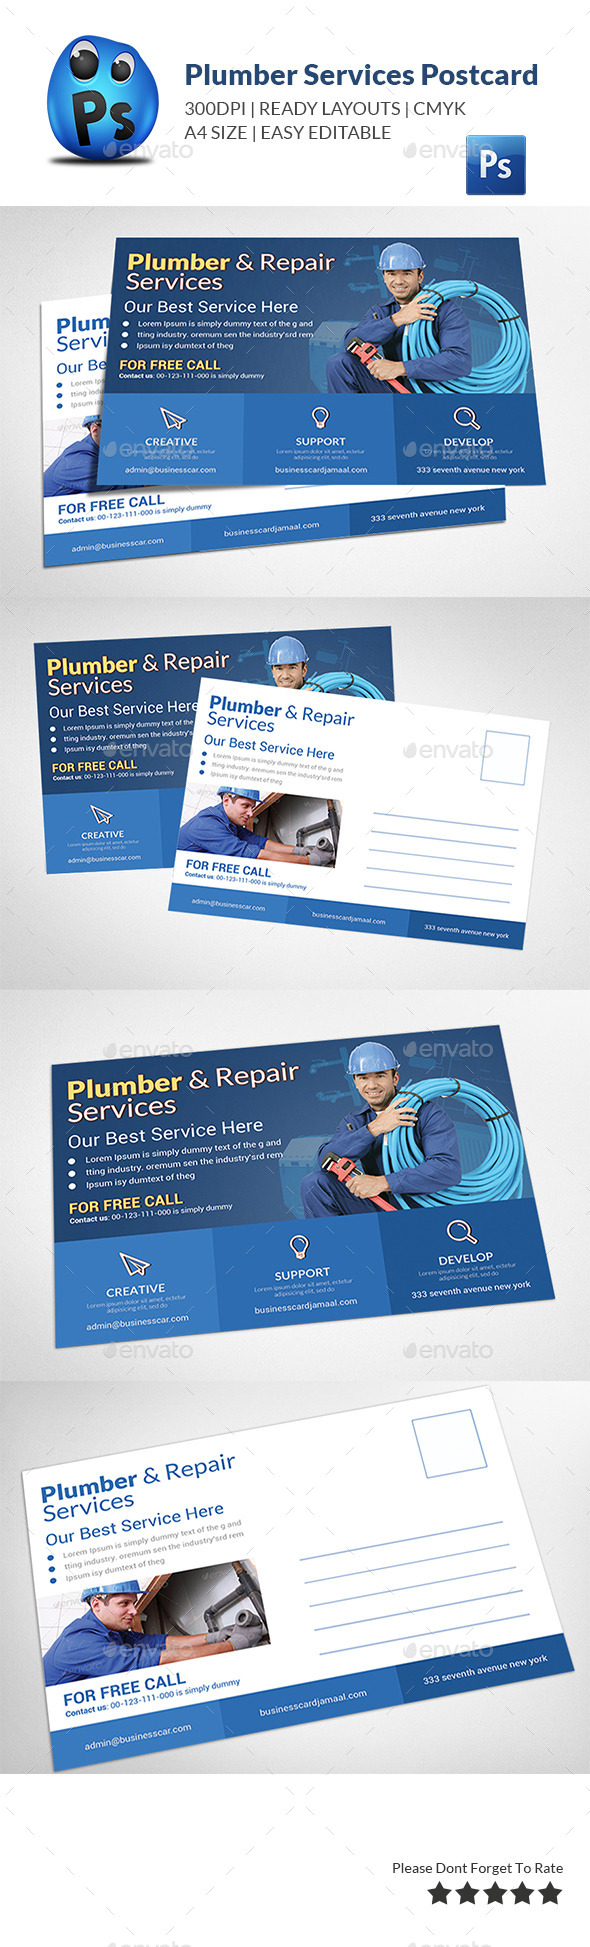 GraphicRiver Plumber Service Postcard Template 11950413